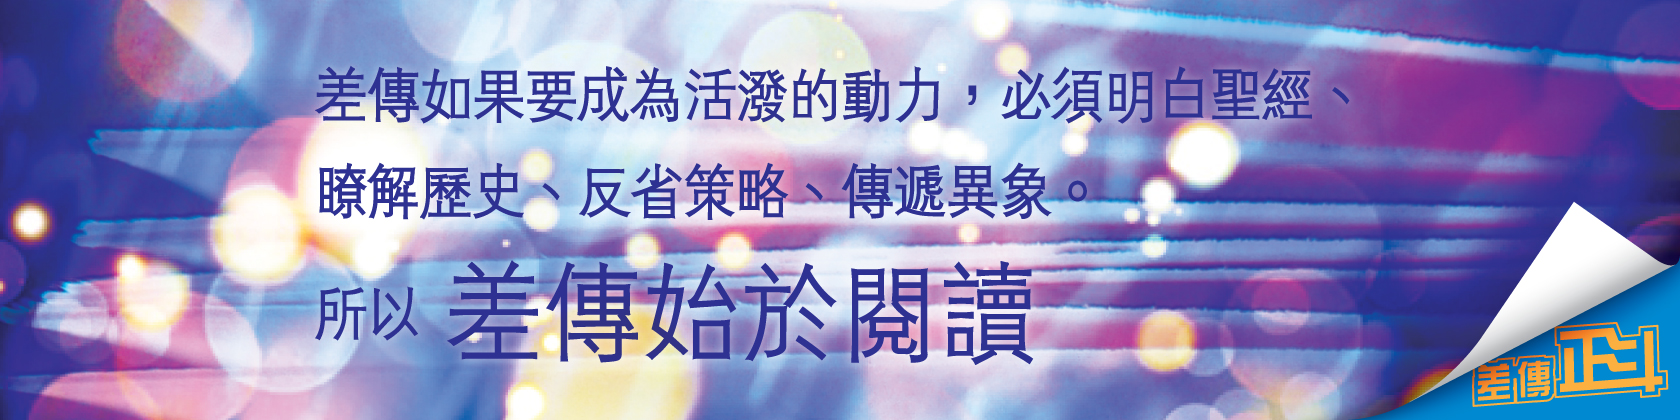 CB-01-web-banner-1680-x-420-B1-01